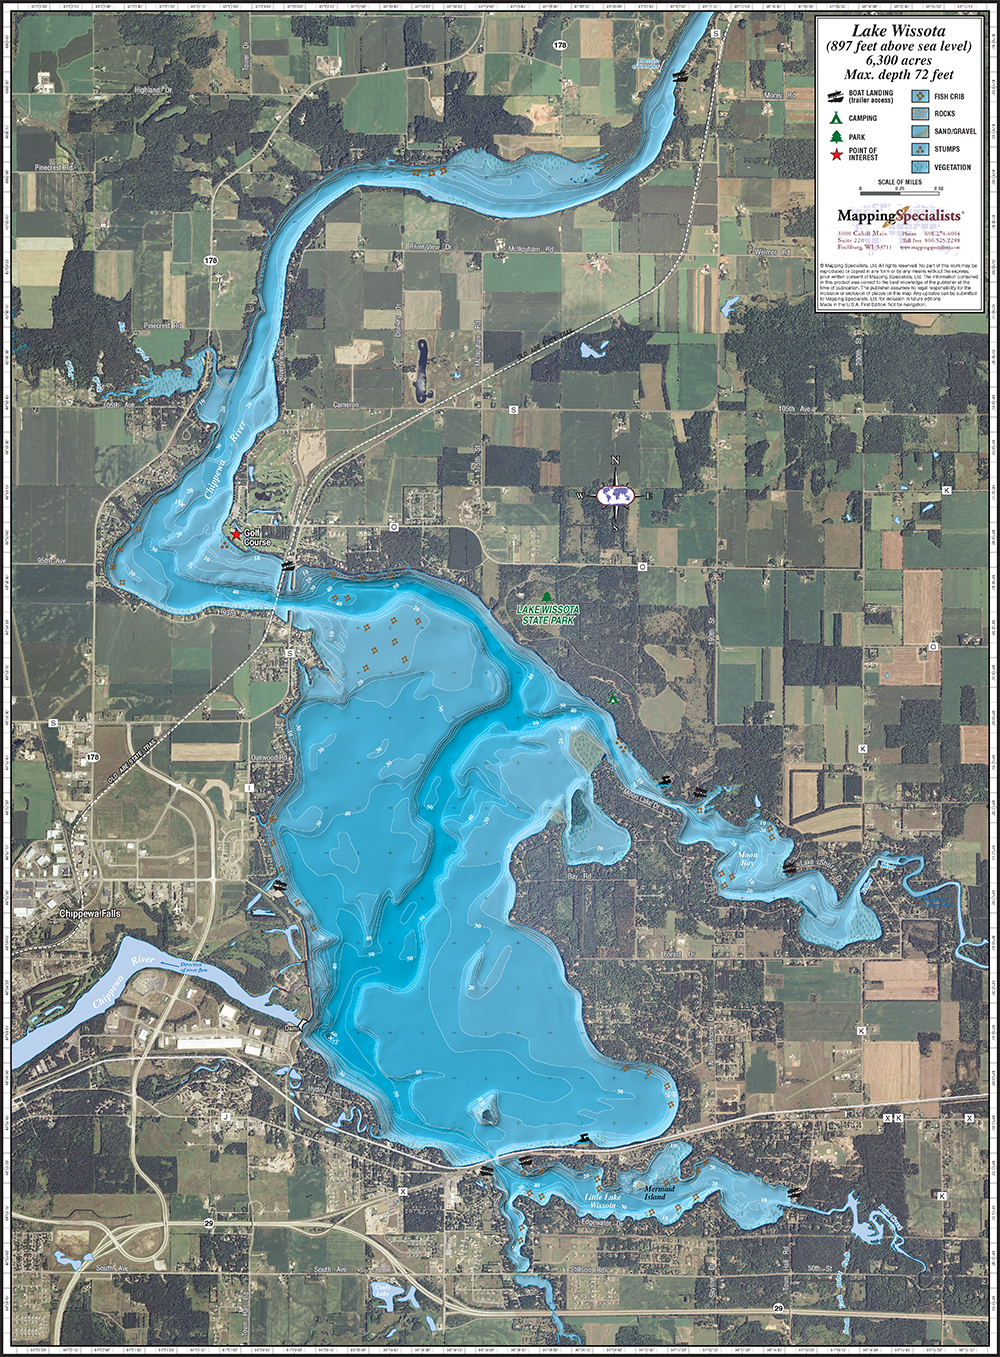 Lake Wissota Enhanced Wall Map